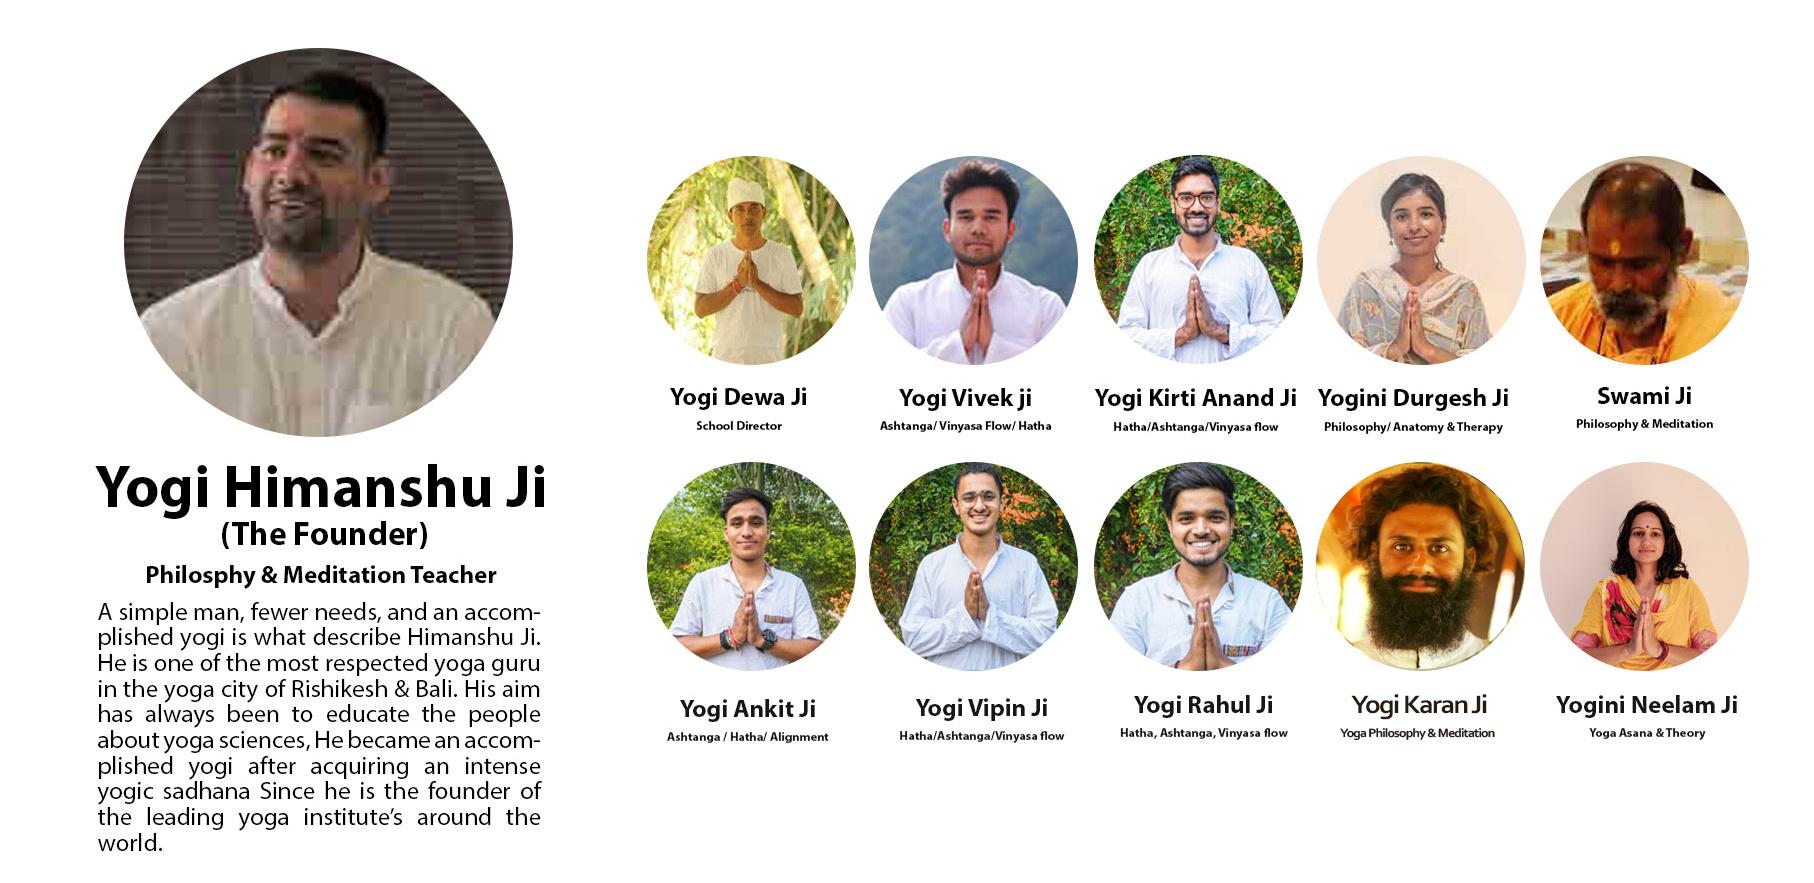 bali yoga teachers